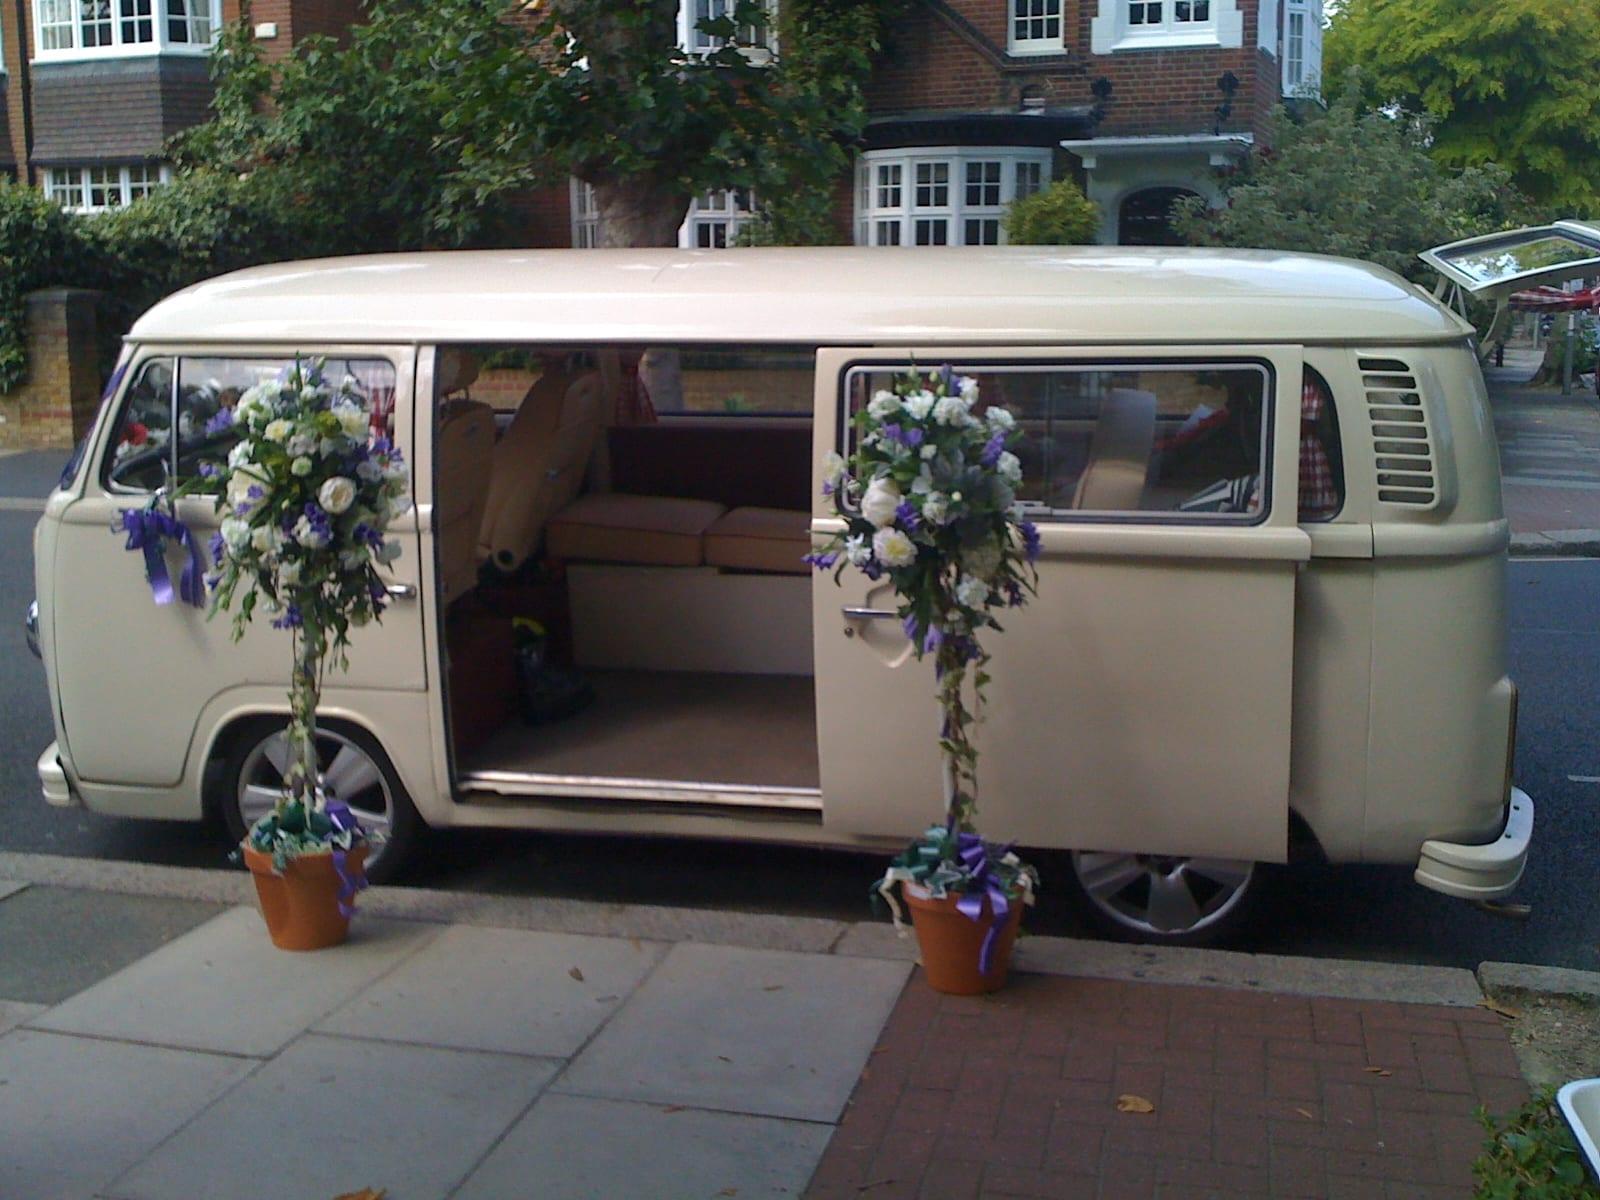 Campervan with wedding flowers